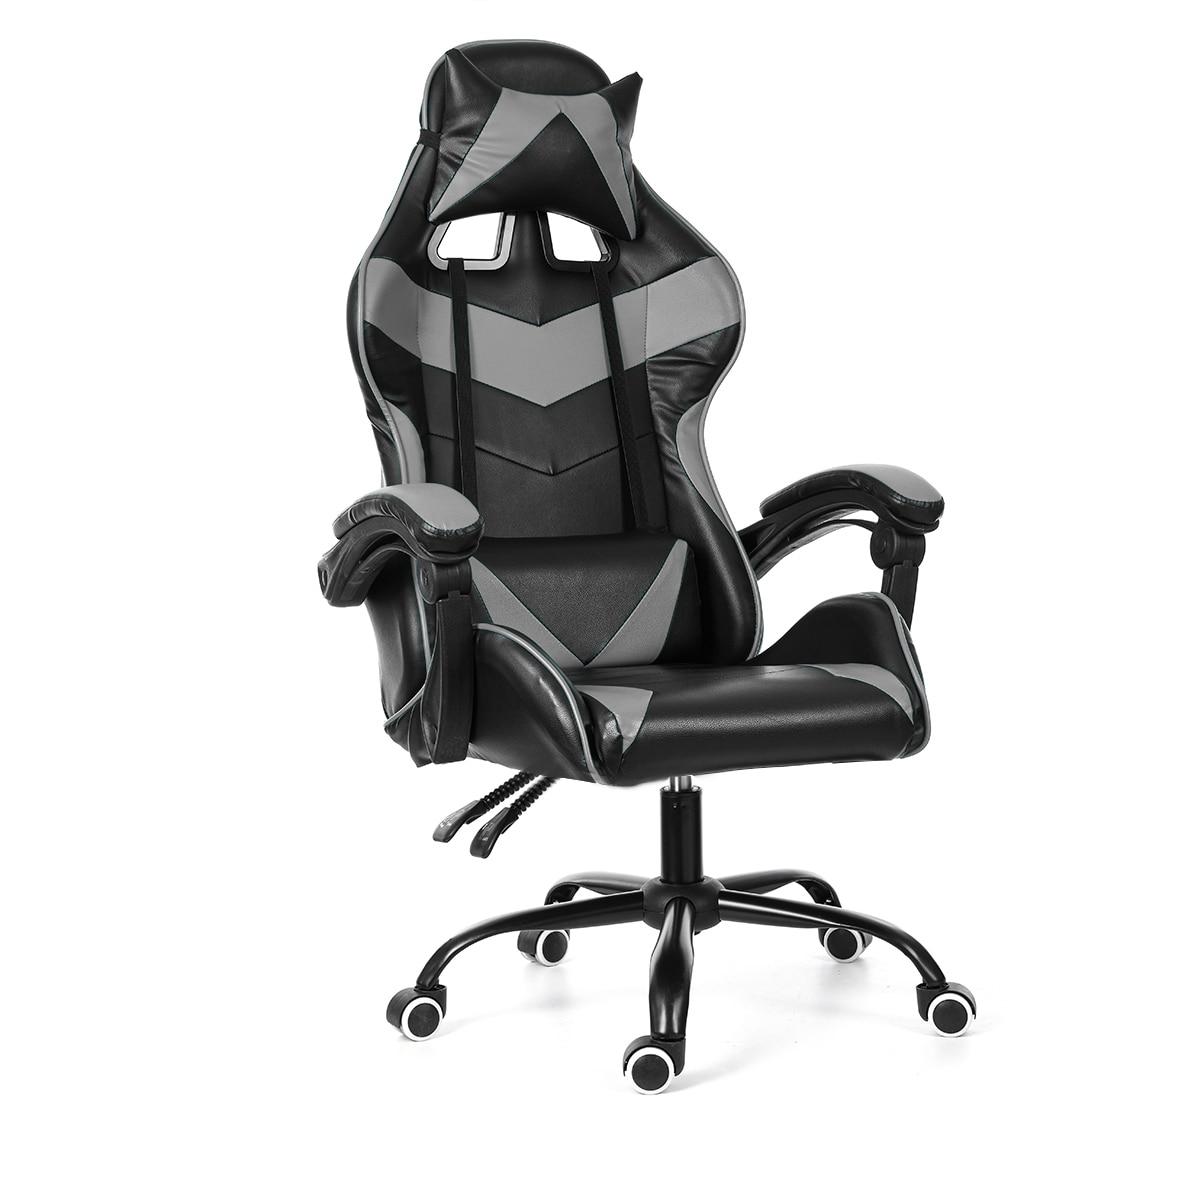 Shipping Büro Stuhl WCG Gaming Stuhl Computer Stuhl Internet Cafe Racing Stuhl WCG Gamer Liegen Haushalt Stuhl Sessel